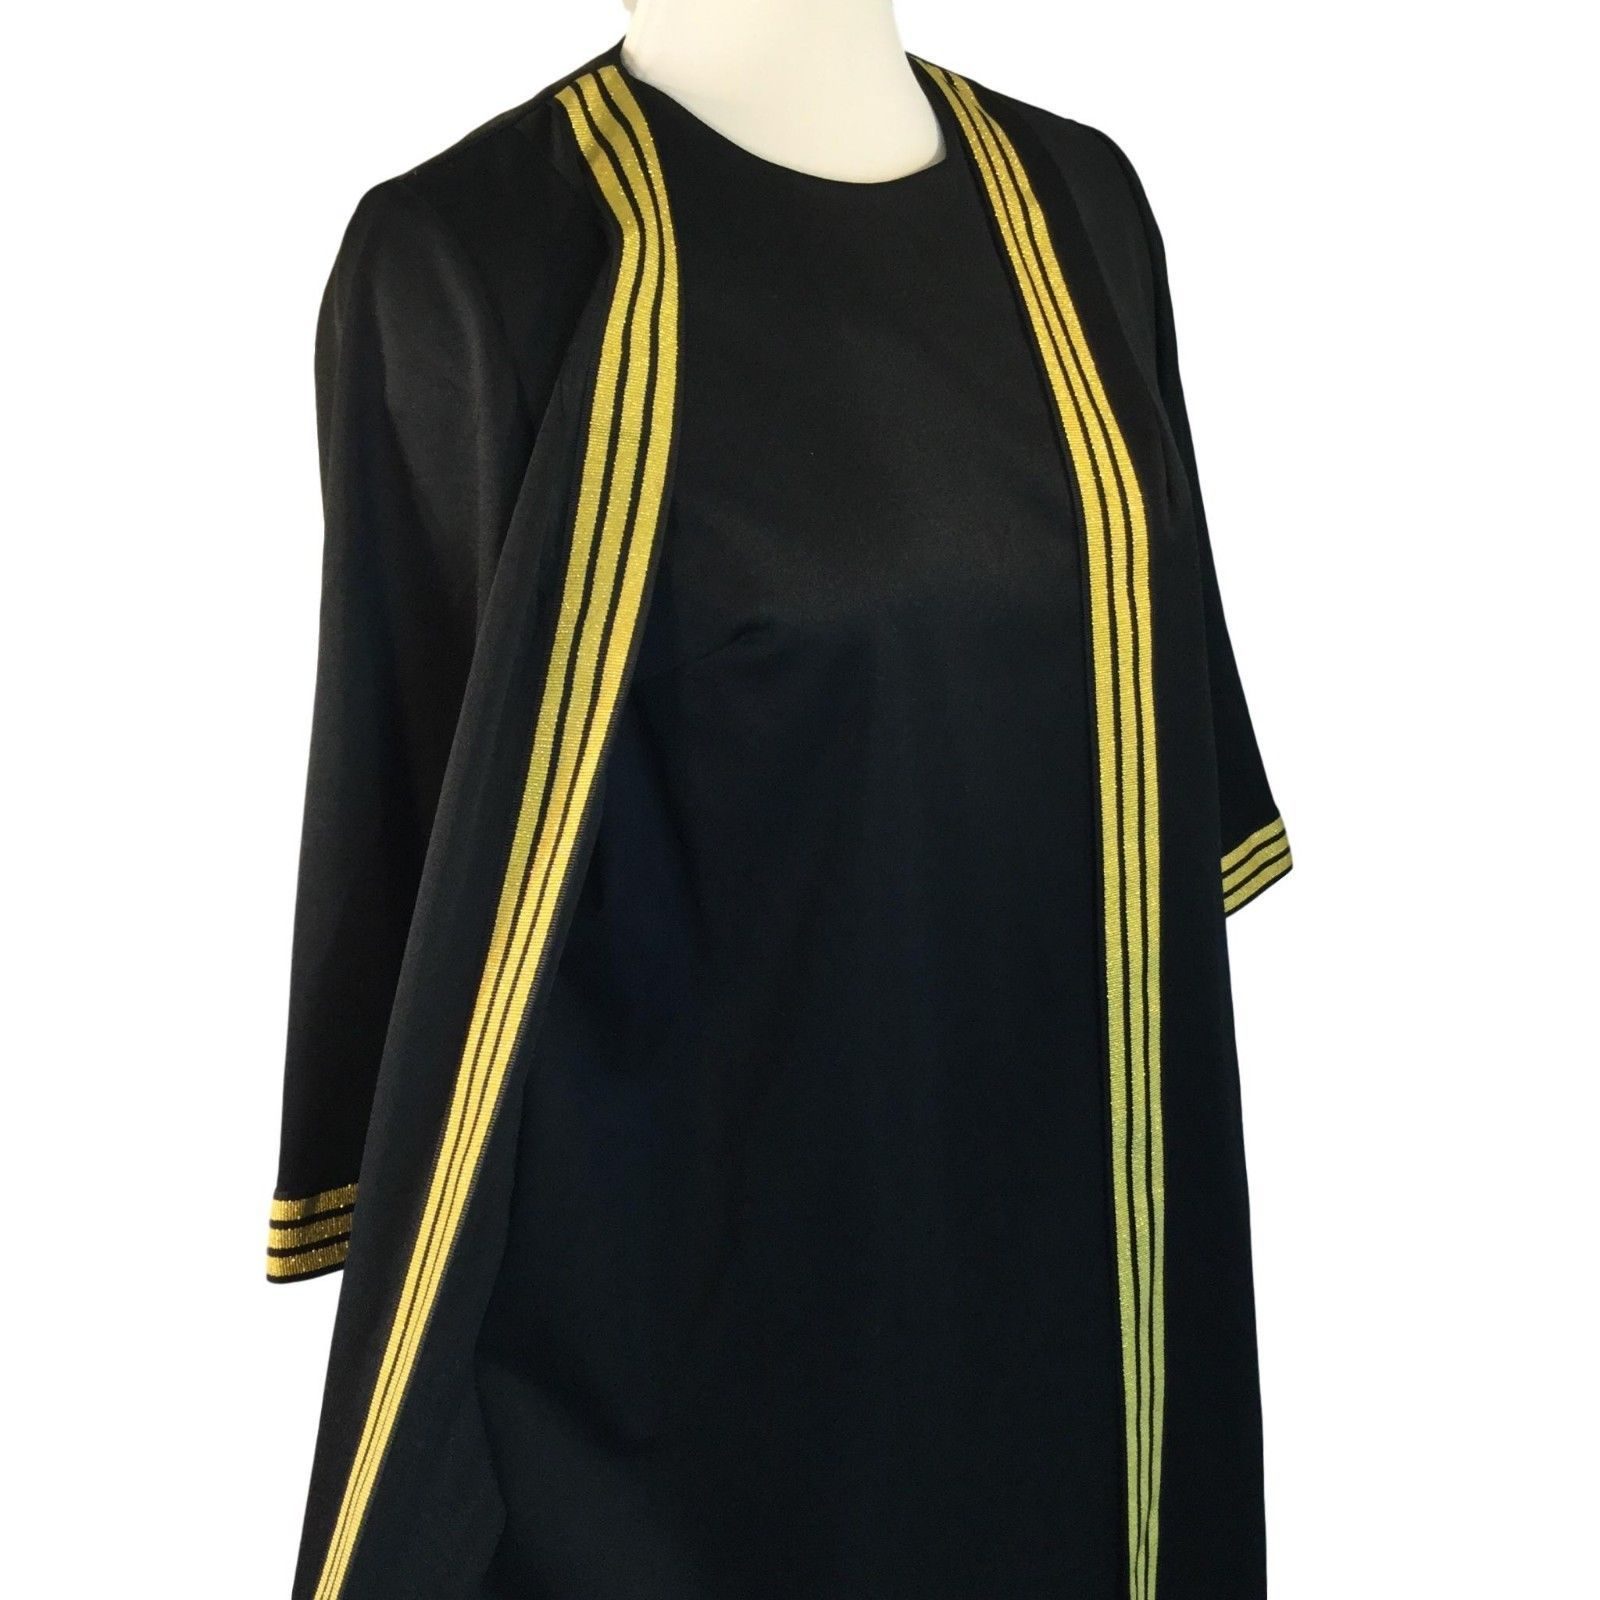 Vtg Berkshire B-Tween Black Gold Lurex Stripe Hostess Dress Jacket 1 pc Outfit M